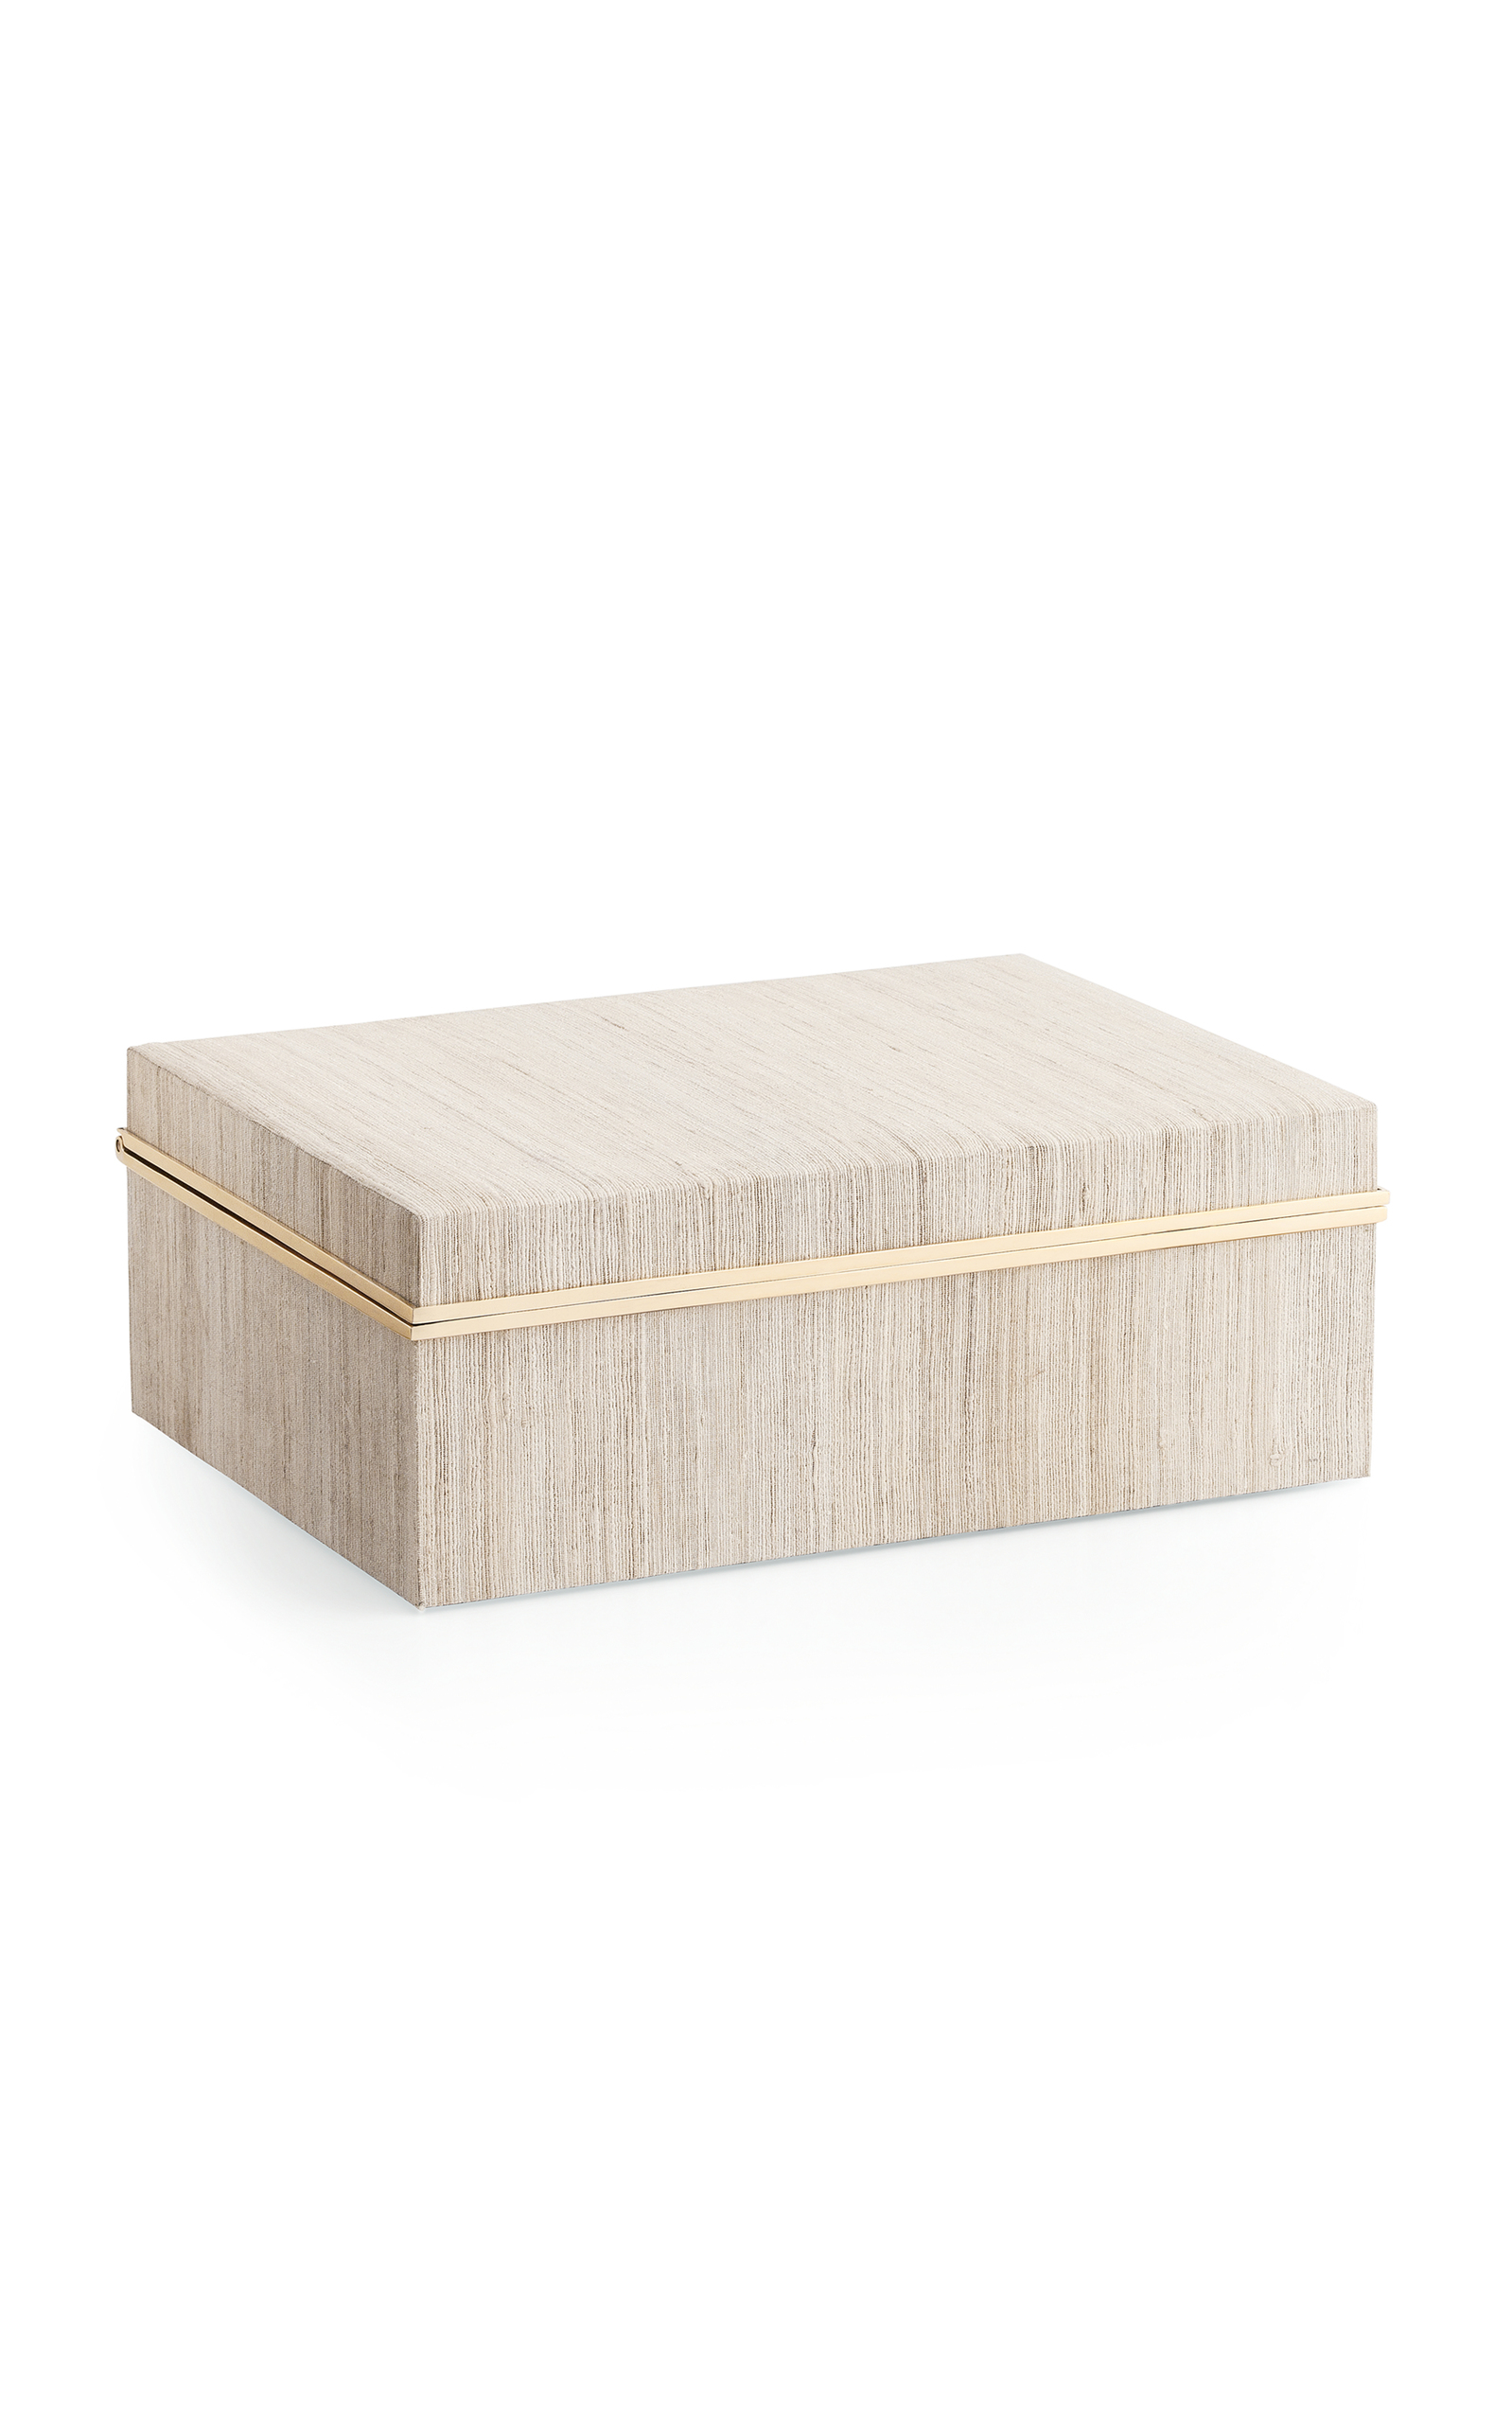 Jacqueline Jewelry Box By Ralph Lauren Home Moda Operandi # Muebles Ralph Lauren Espana